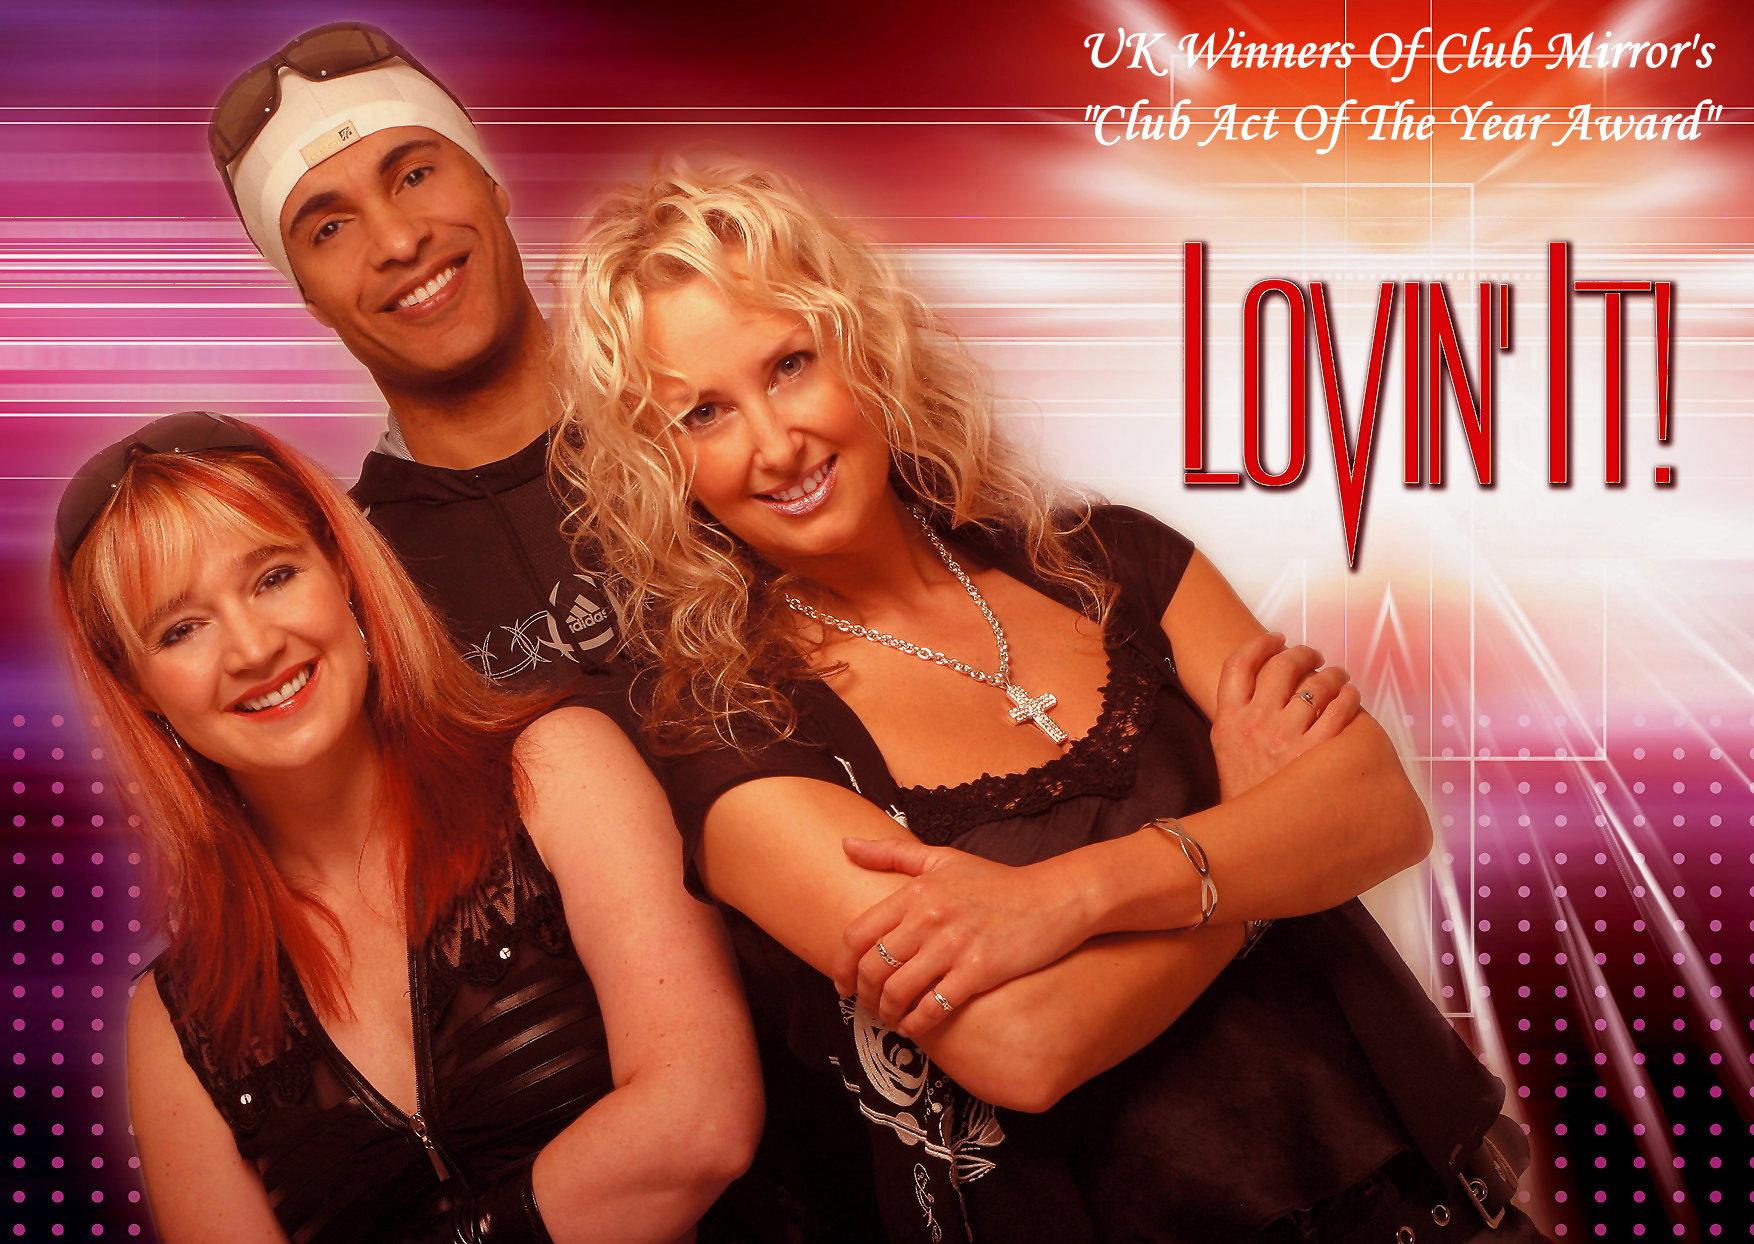 Lovin It - Trio Band